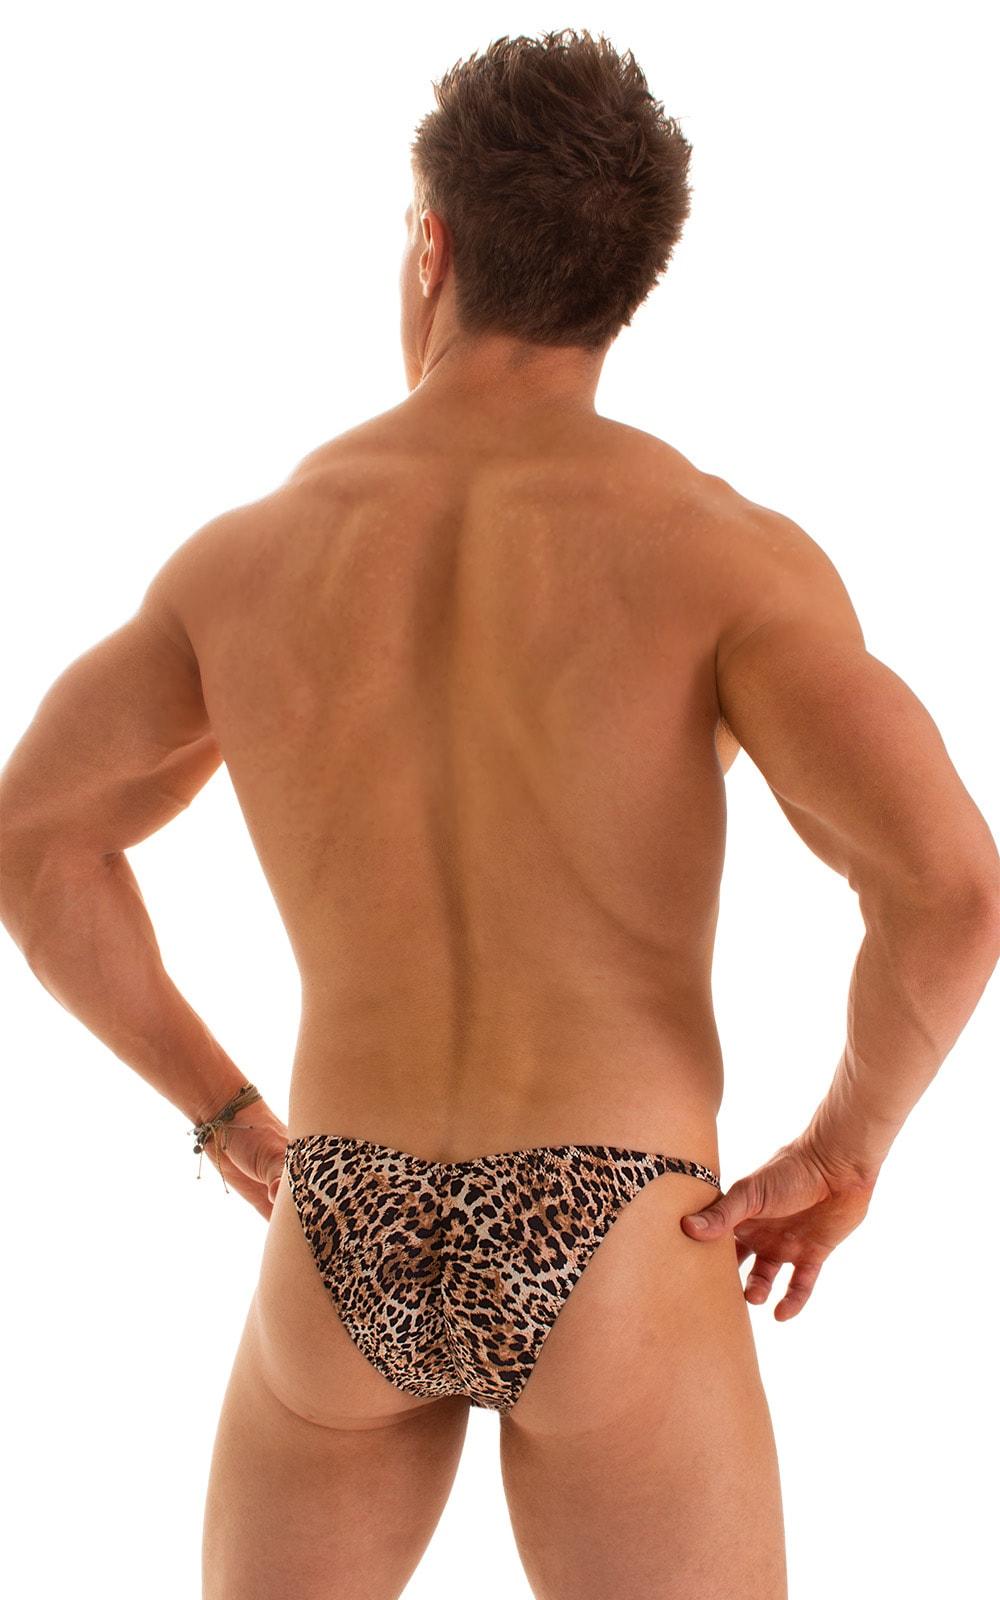 Micro Pouch - Puckered Back - Rio Bikini in Super ThinSkinz Cheeta 2